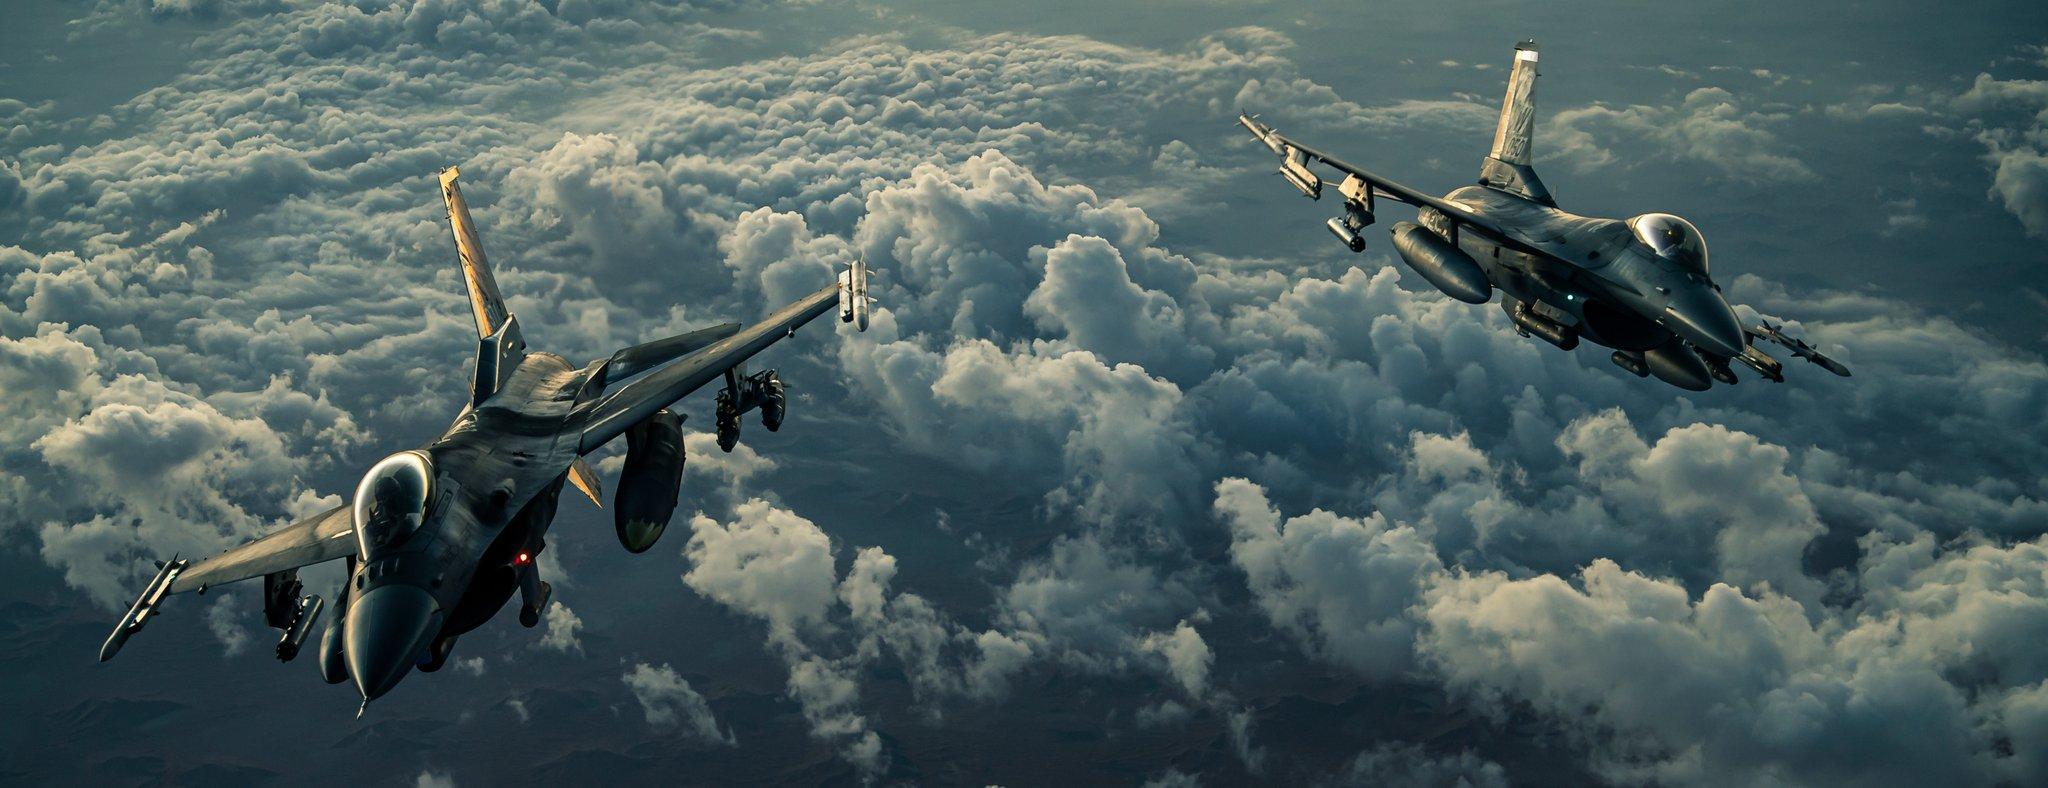 US Air Force - USAF - Page 30 ErTrjyQW8AEcYTW?format=jpg&name=large